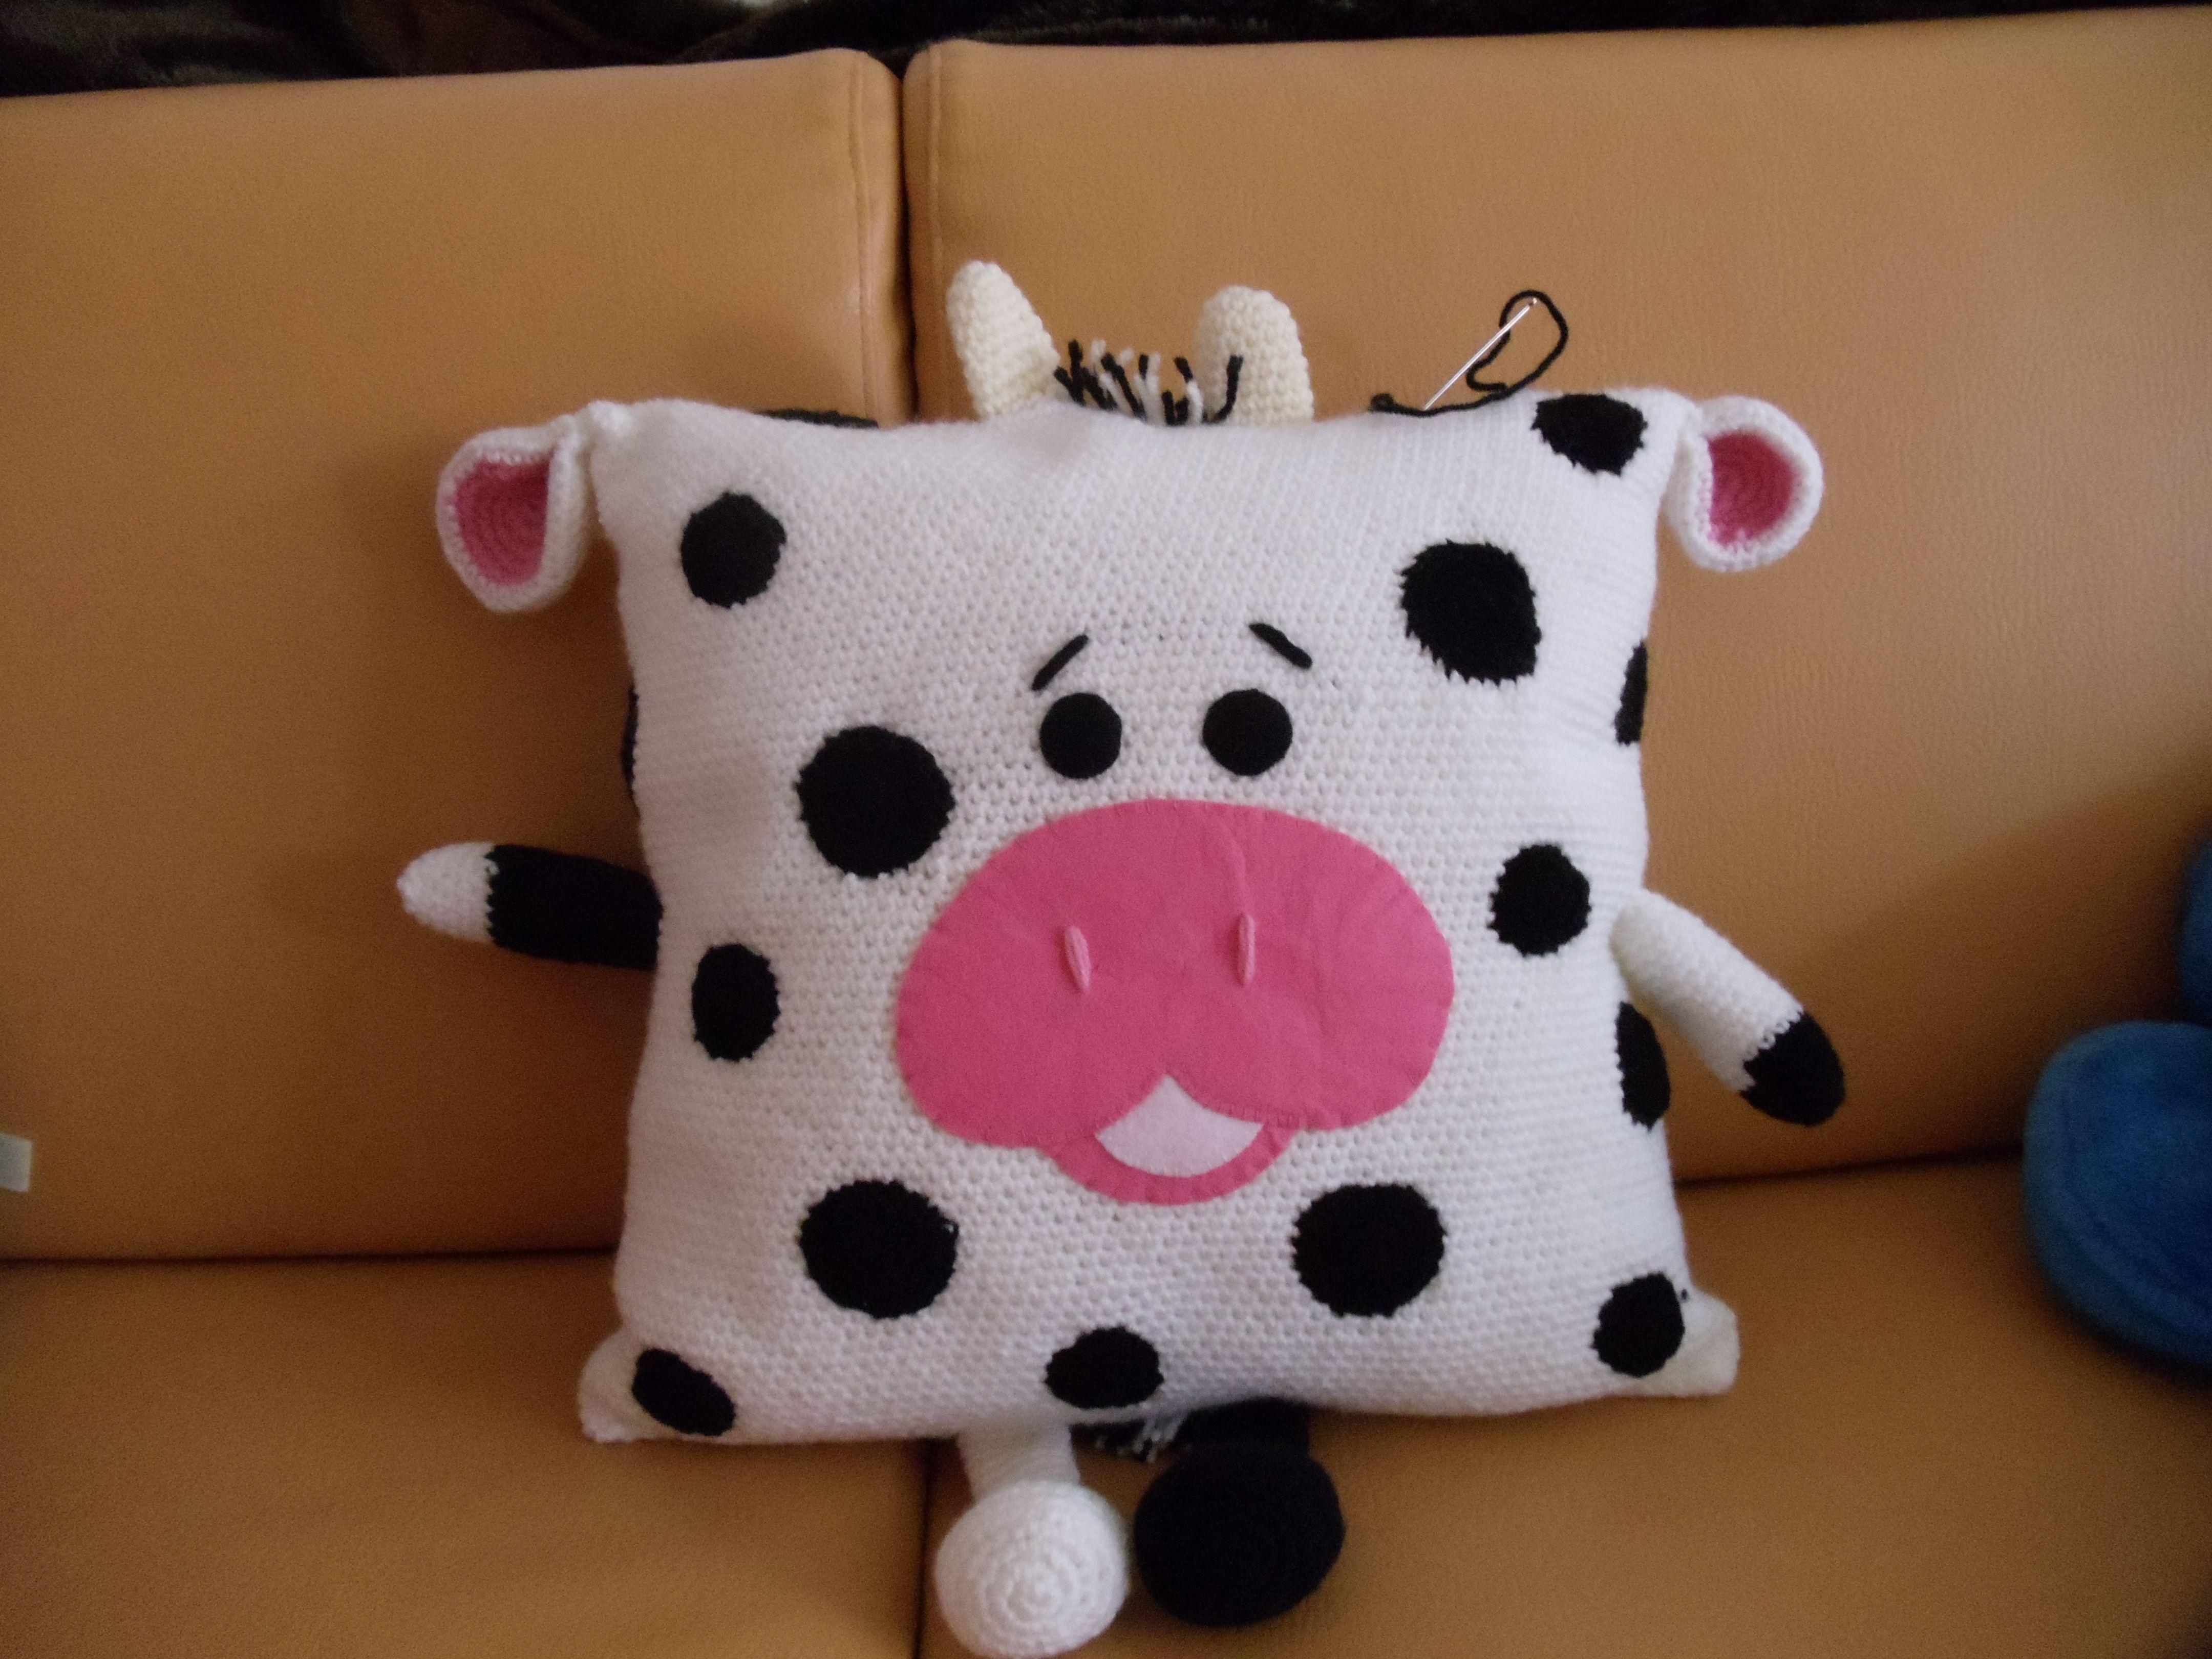 Easy Crochet Animals Amigurumi : Crochet pattern sitting bunny amigurumi tutorial by sidrunszoo